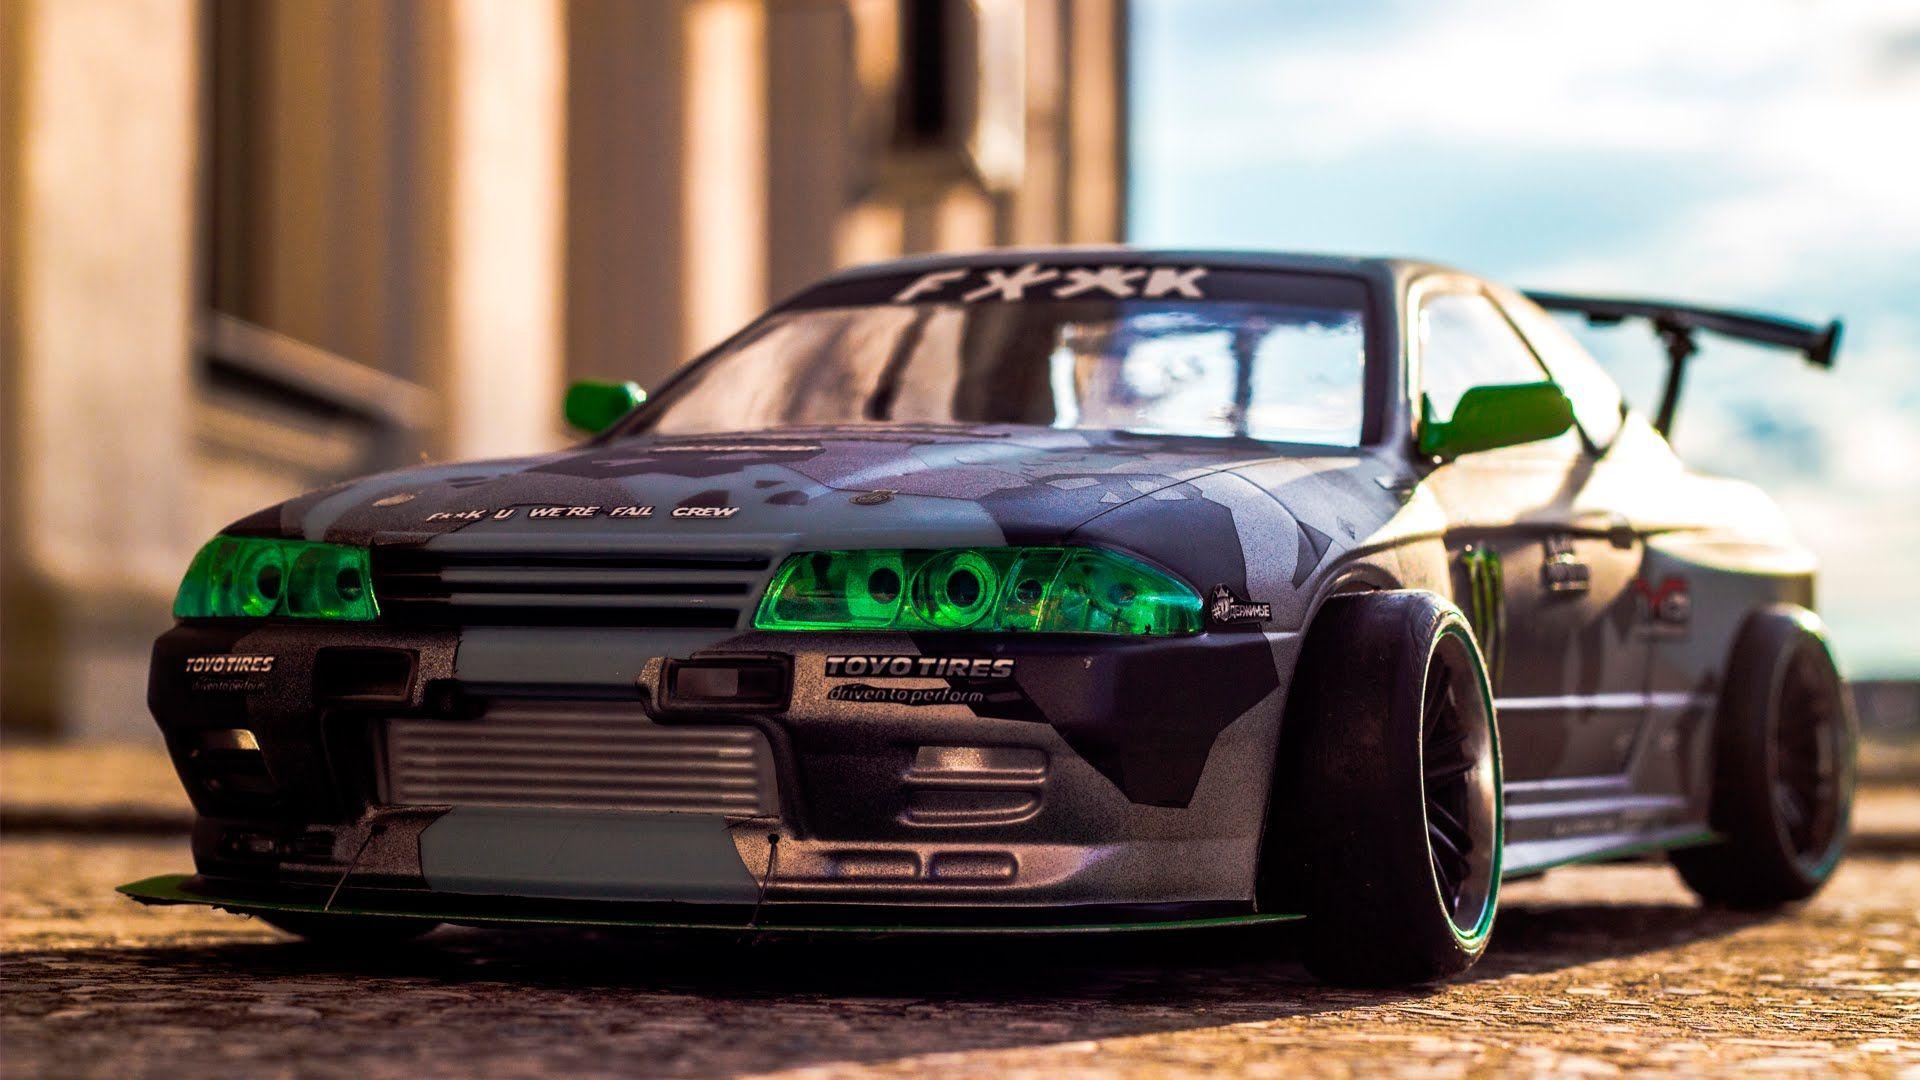 Badass Rc Drift Car Nissan Skyline Gt R Rc Drift